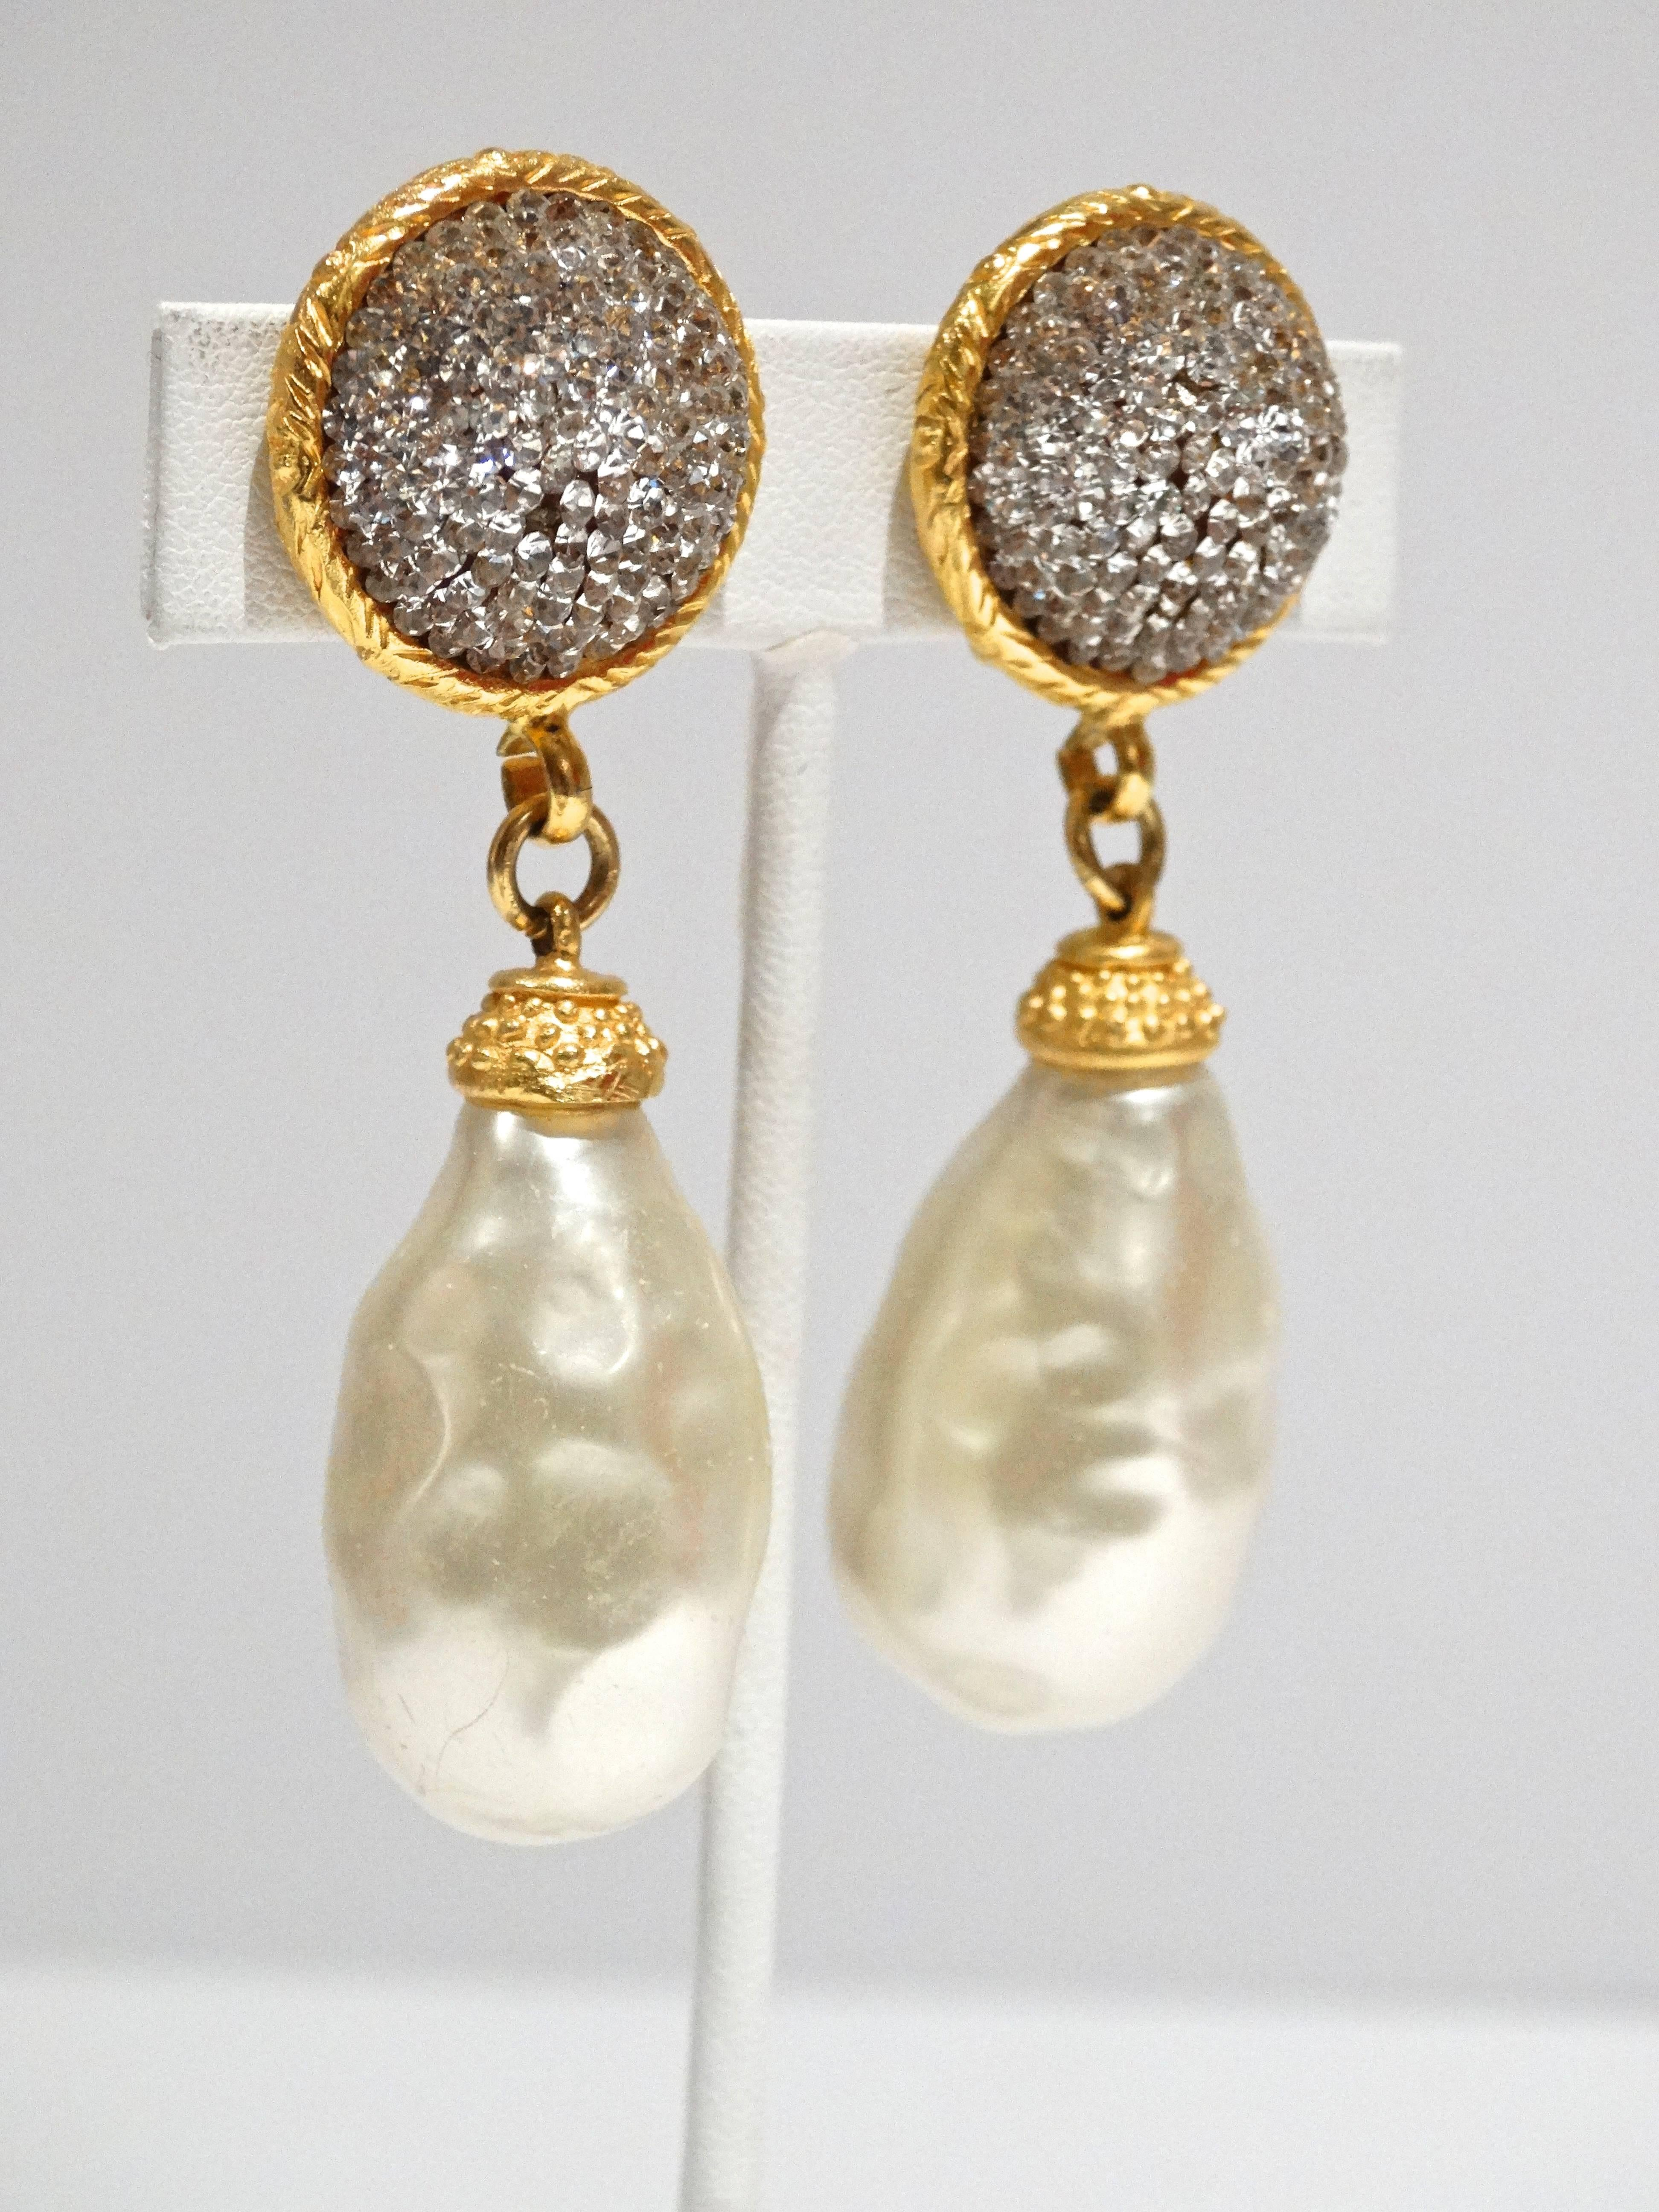 c177cb92ceb462 1990s Deanna Hamro Crystal Diamente Swarovski w Faux Drop Pearl Earrings  For Sale at 1stdibs